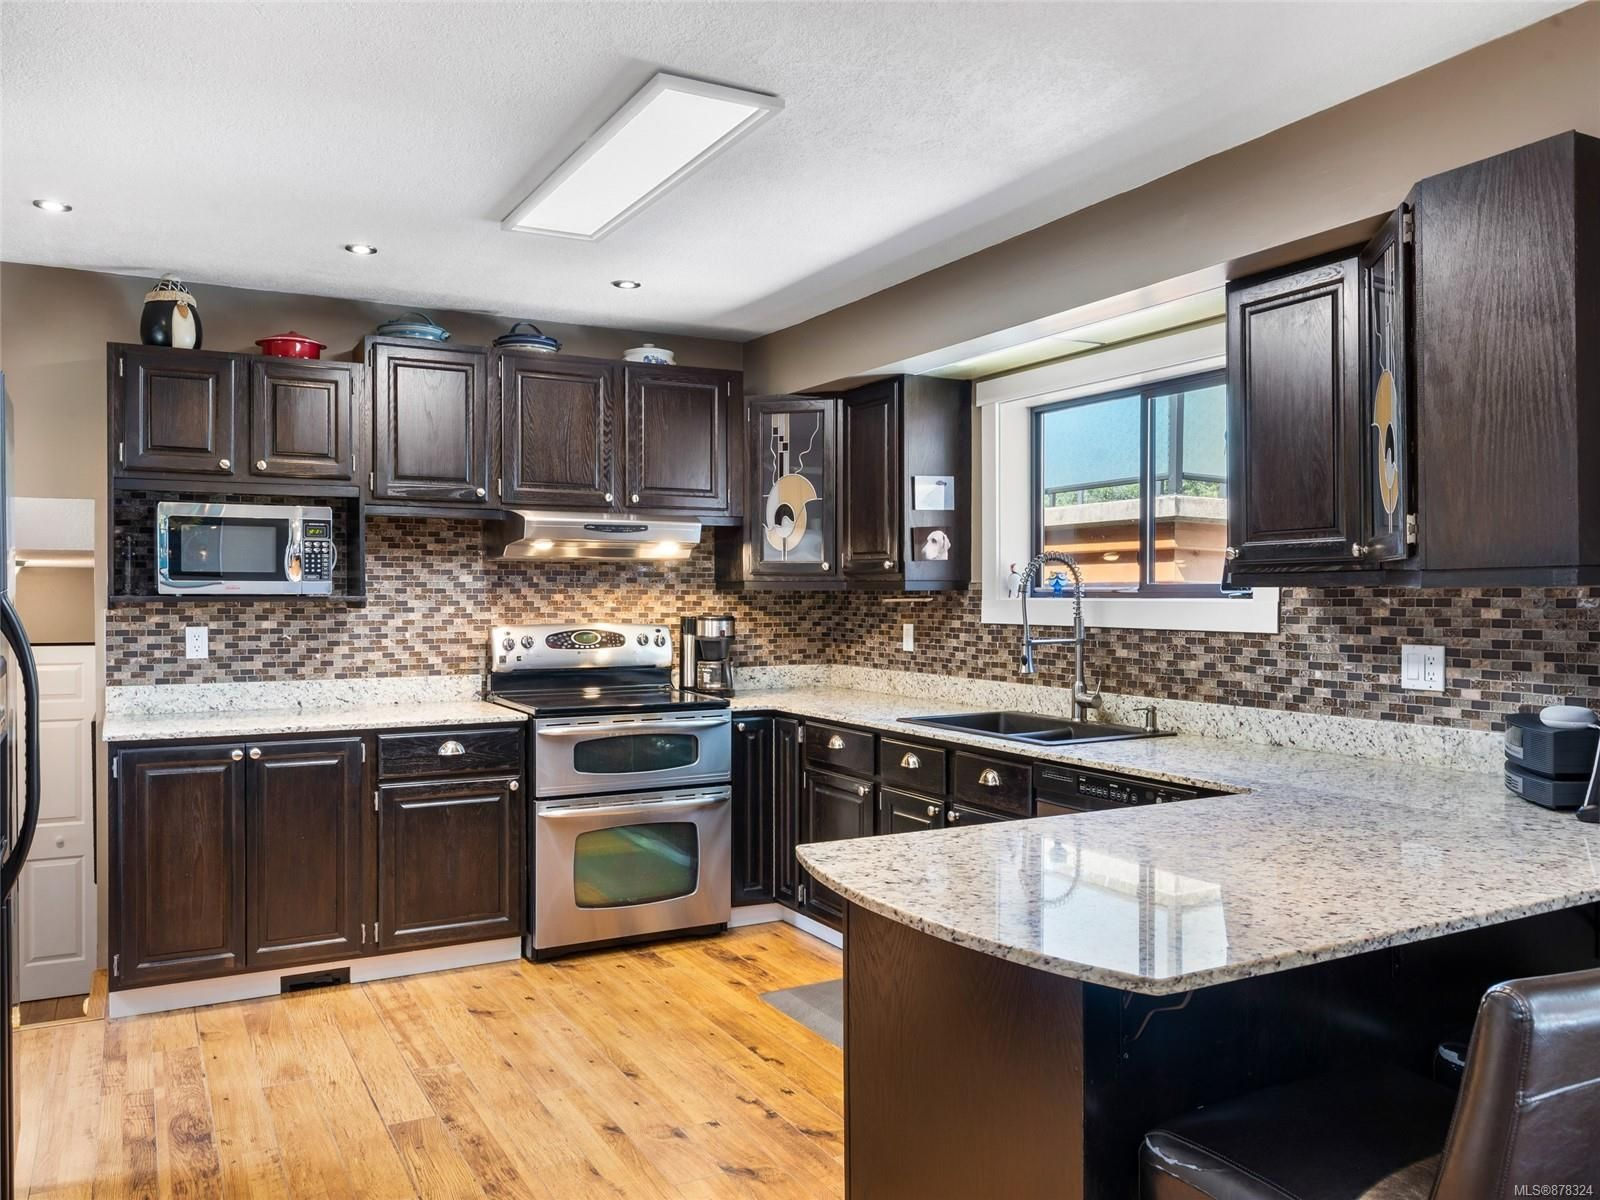 Photo 25: Photos: 3875 Moore Rd in : PA Port Alberni House for sale (Port Alberni)  : MLS®# 878324